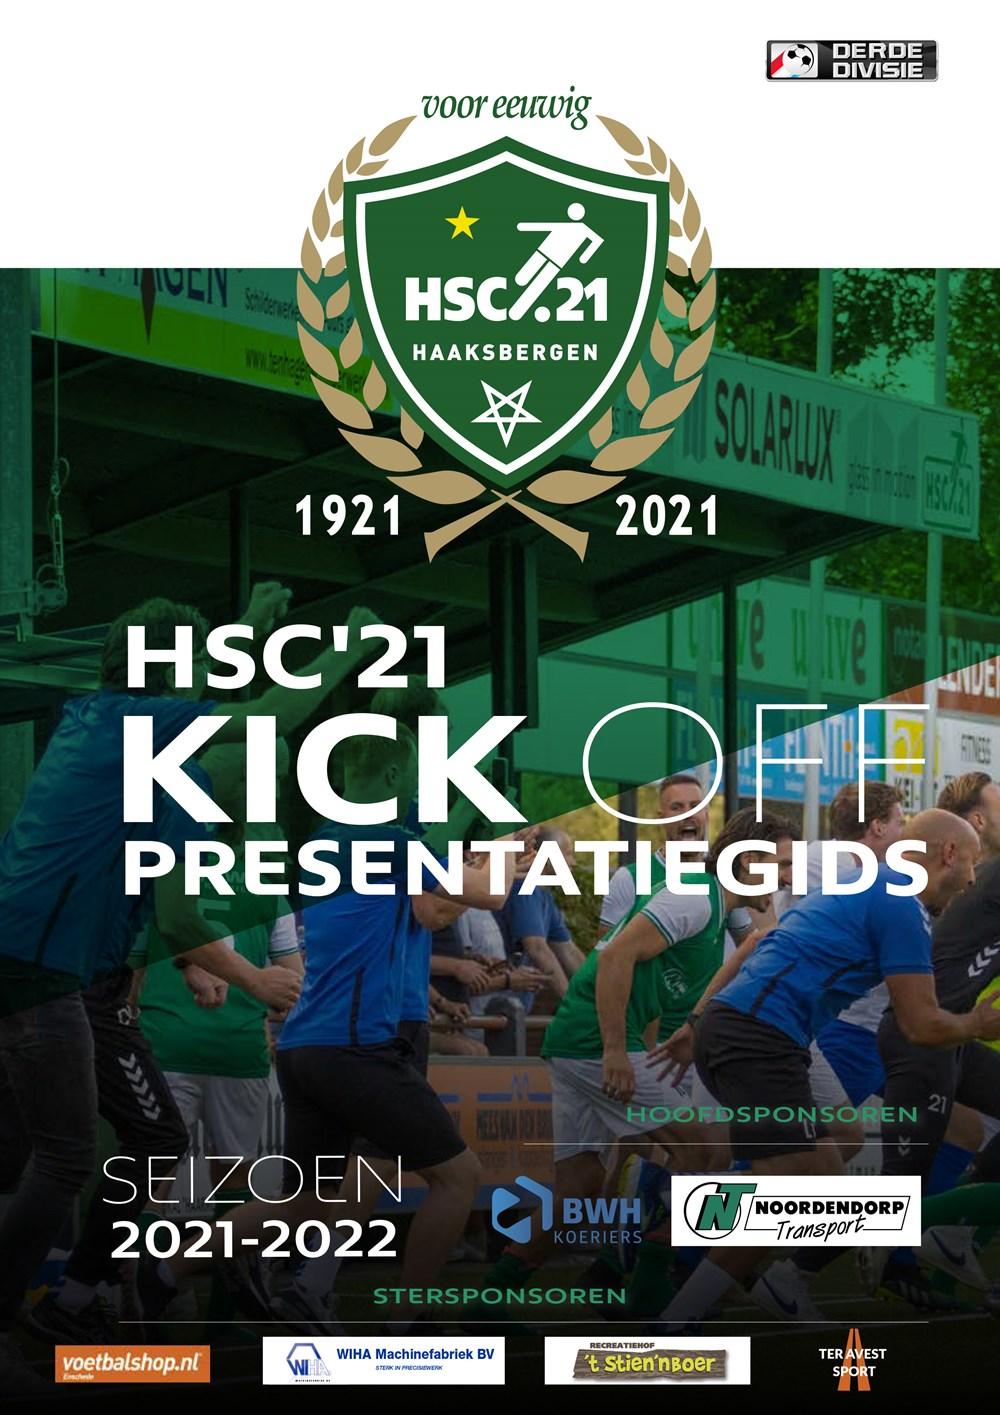 KICK-Off_Presentatie-gids_HSC_21_seizoen_2021-2022_digitaal_edited-1.jpg